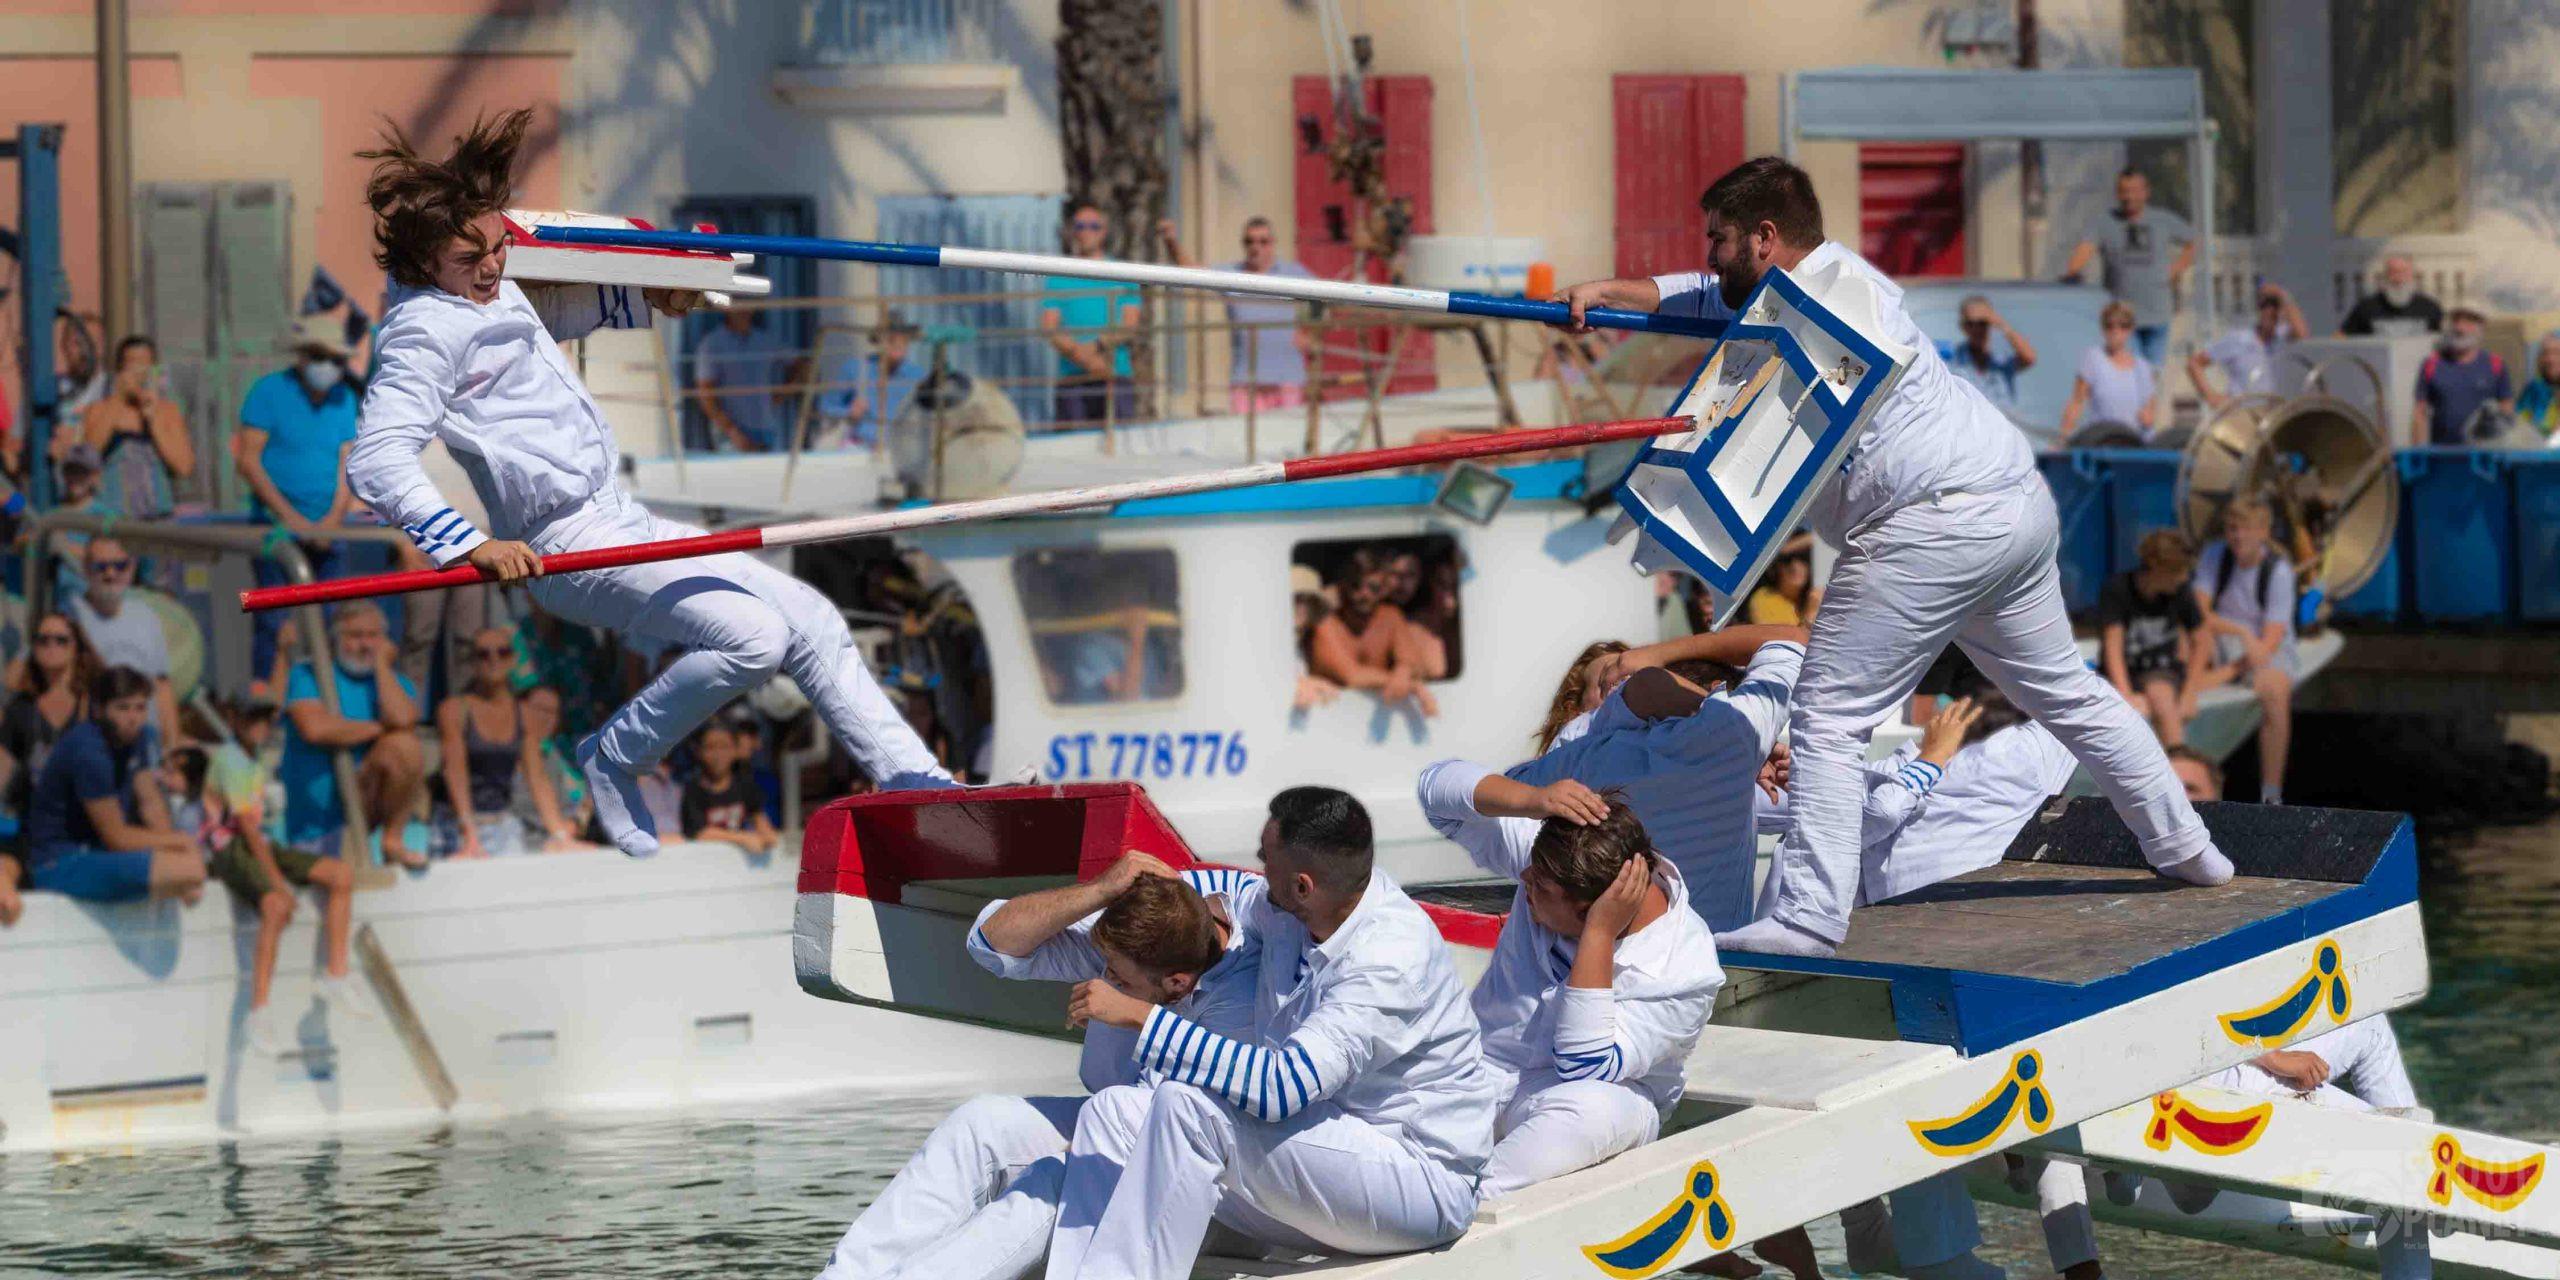 Jousting festival, Grau-du-Roi, Camargue, France